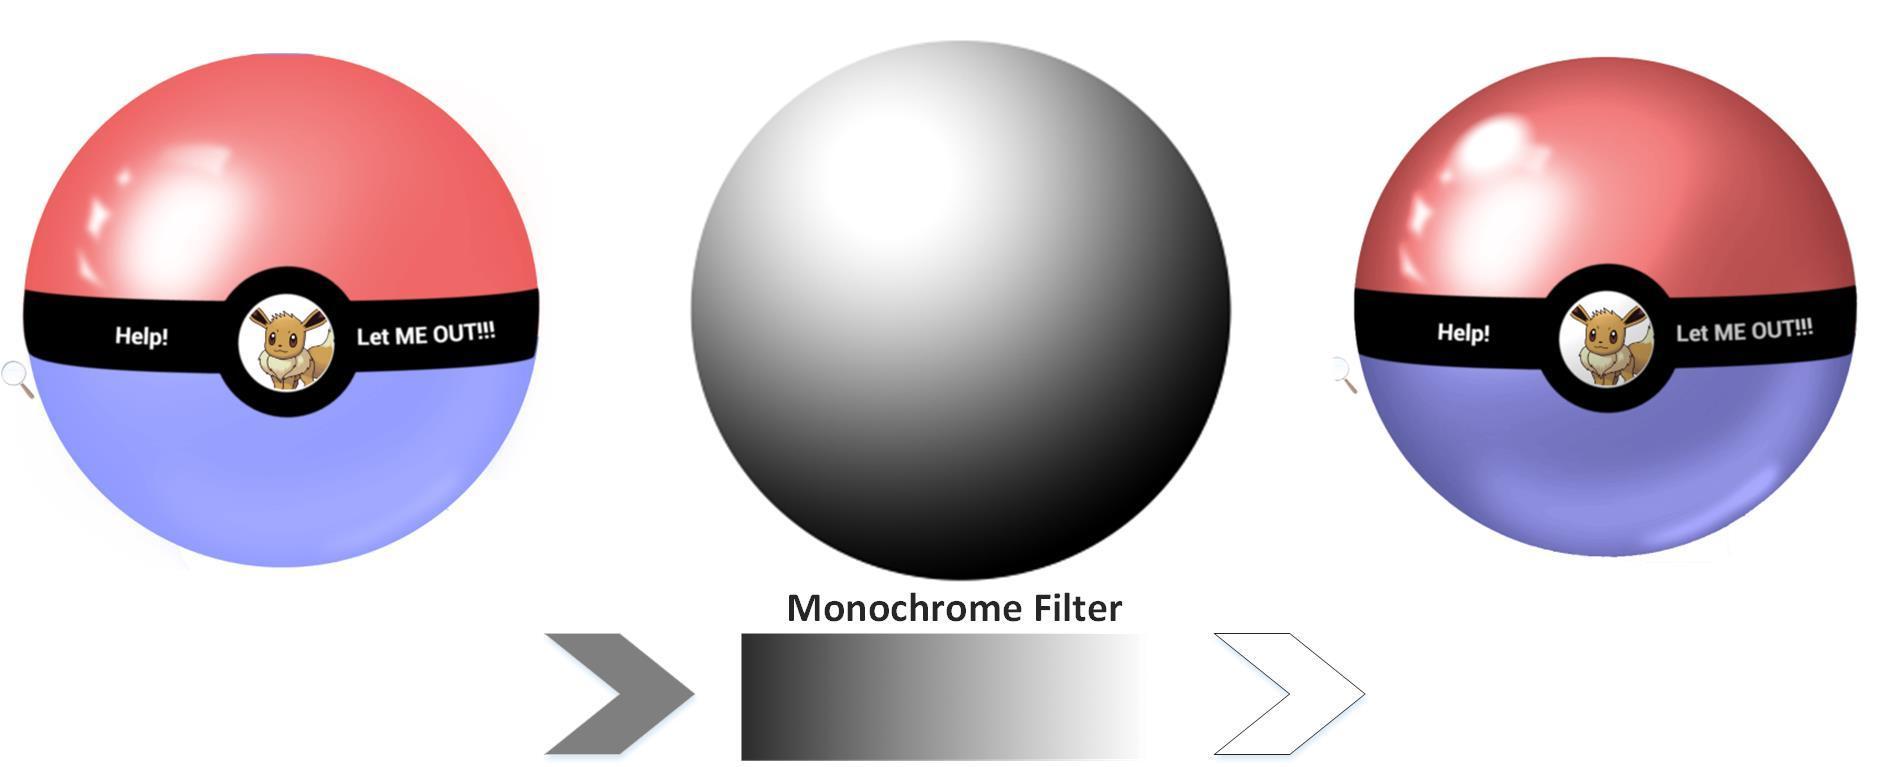 Monochrome-filter